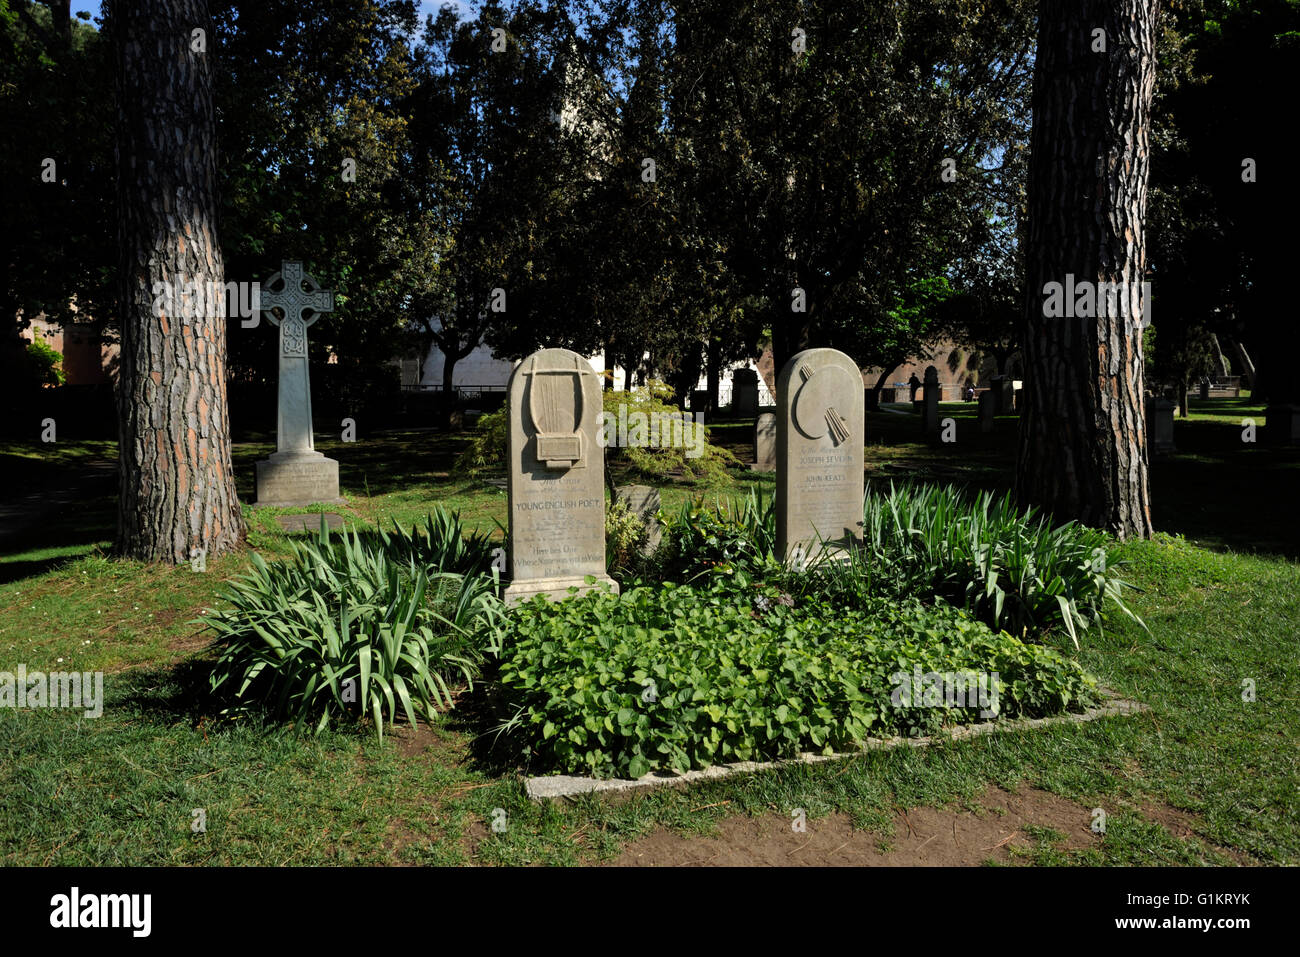 italy, rome, protestant cemetery, graves of john keats and joseph severn - Stock Image